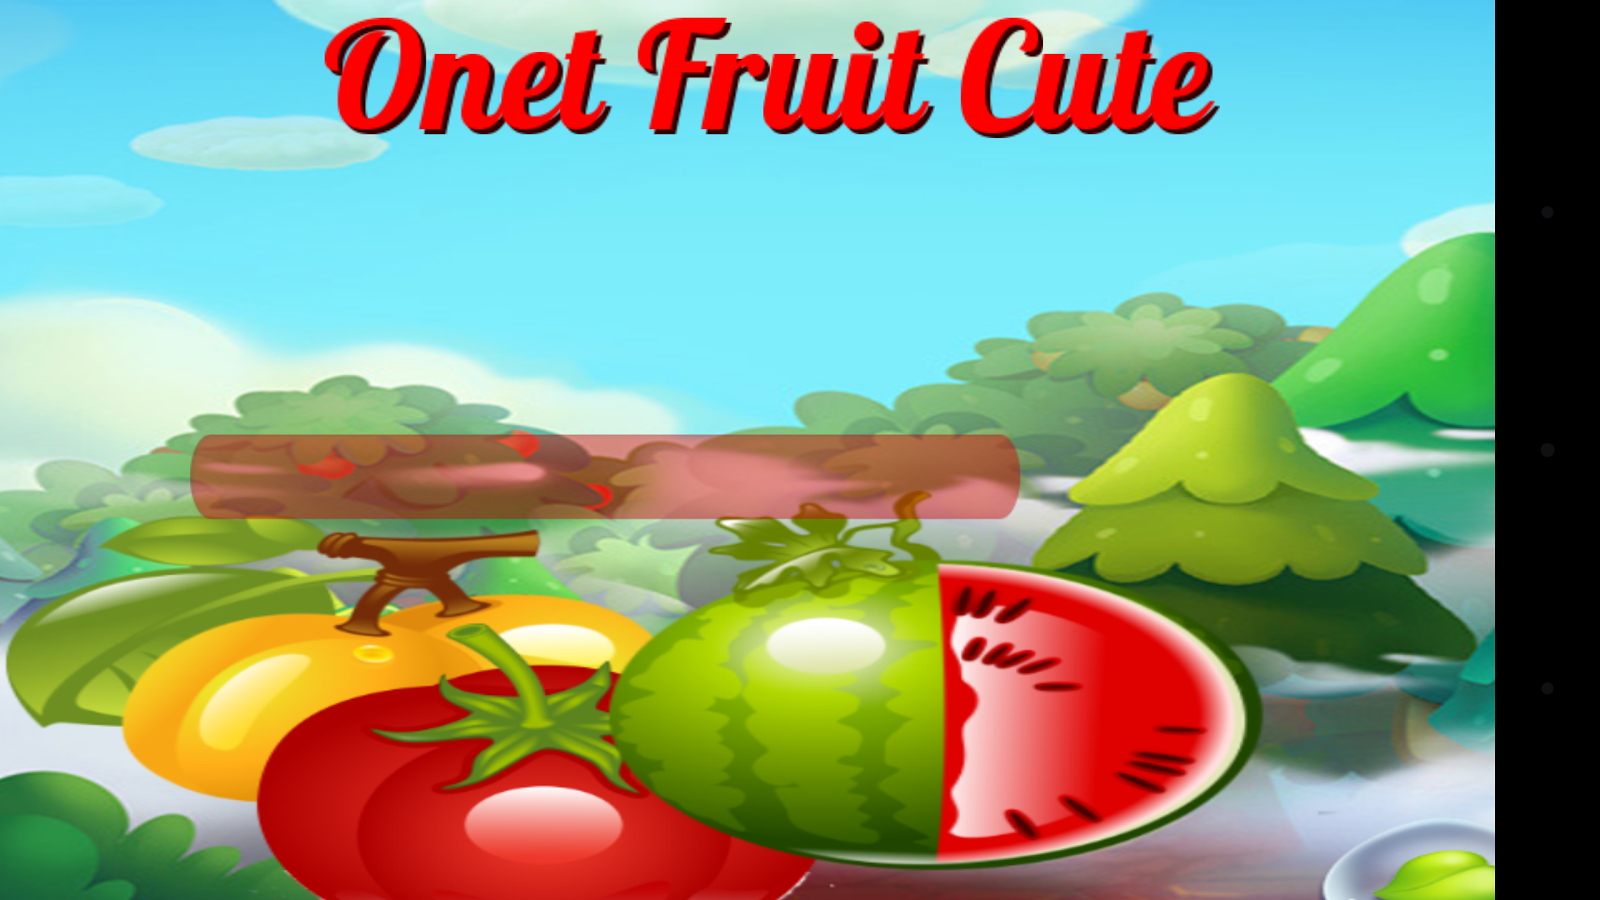 Game onet fruit - Onet Fruit Cute Screenshot